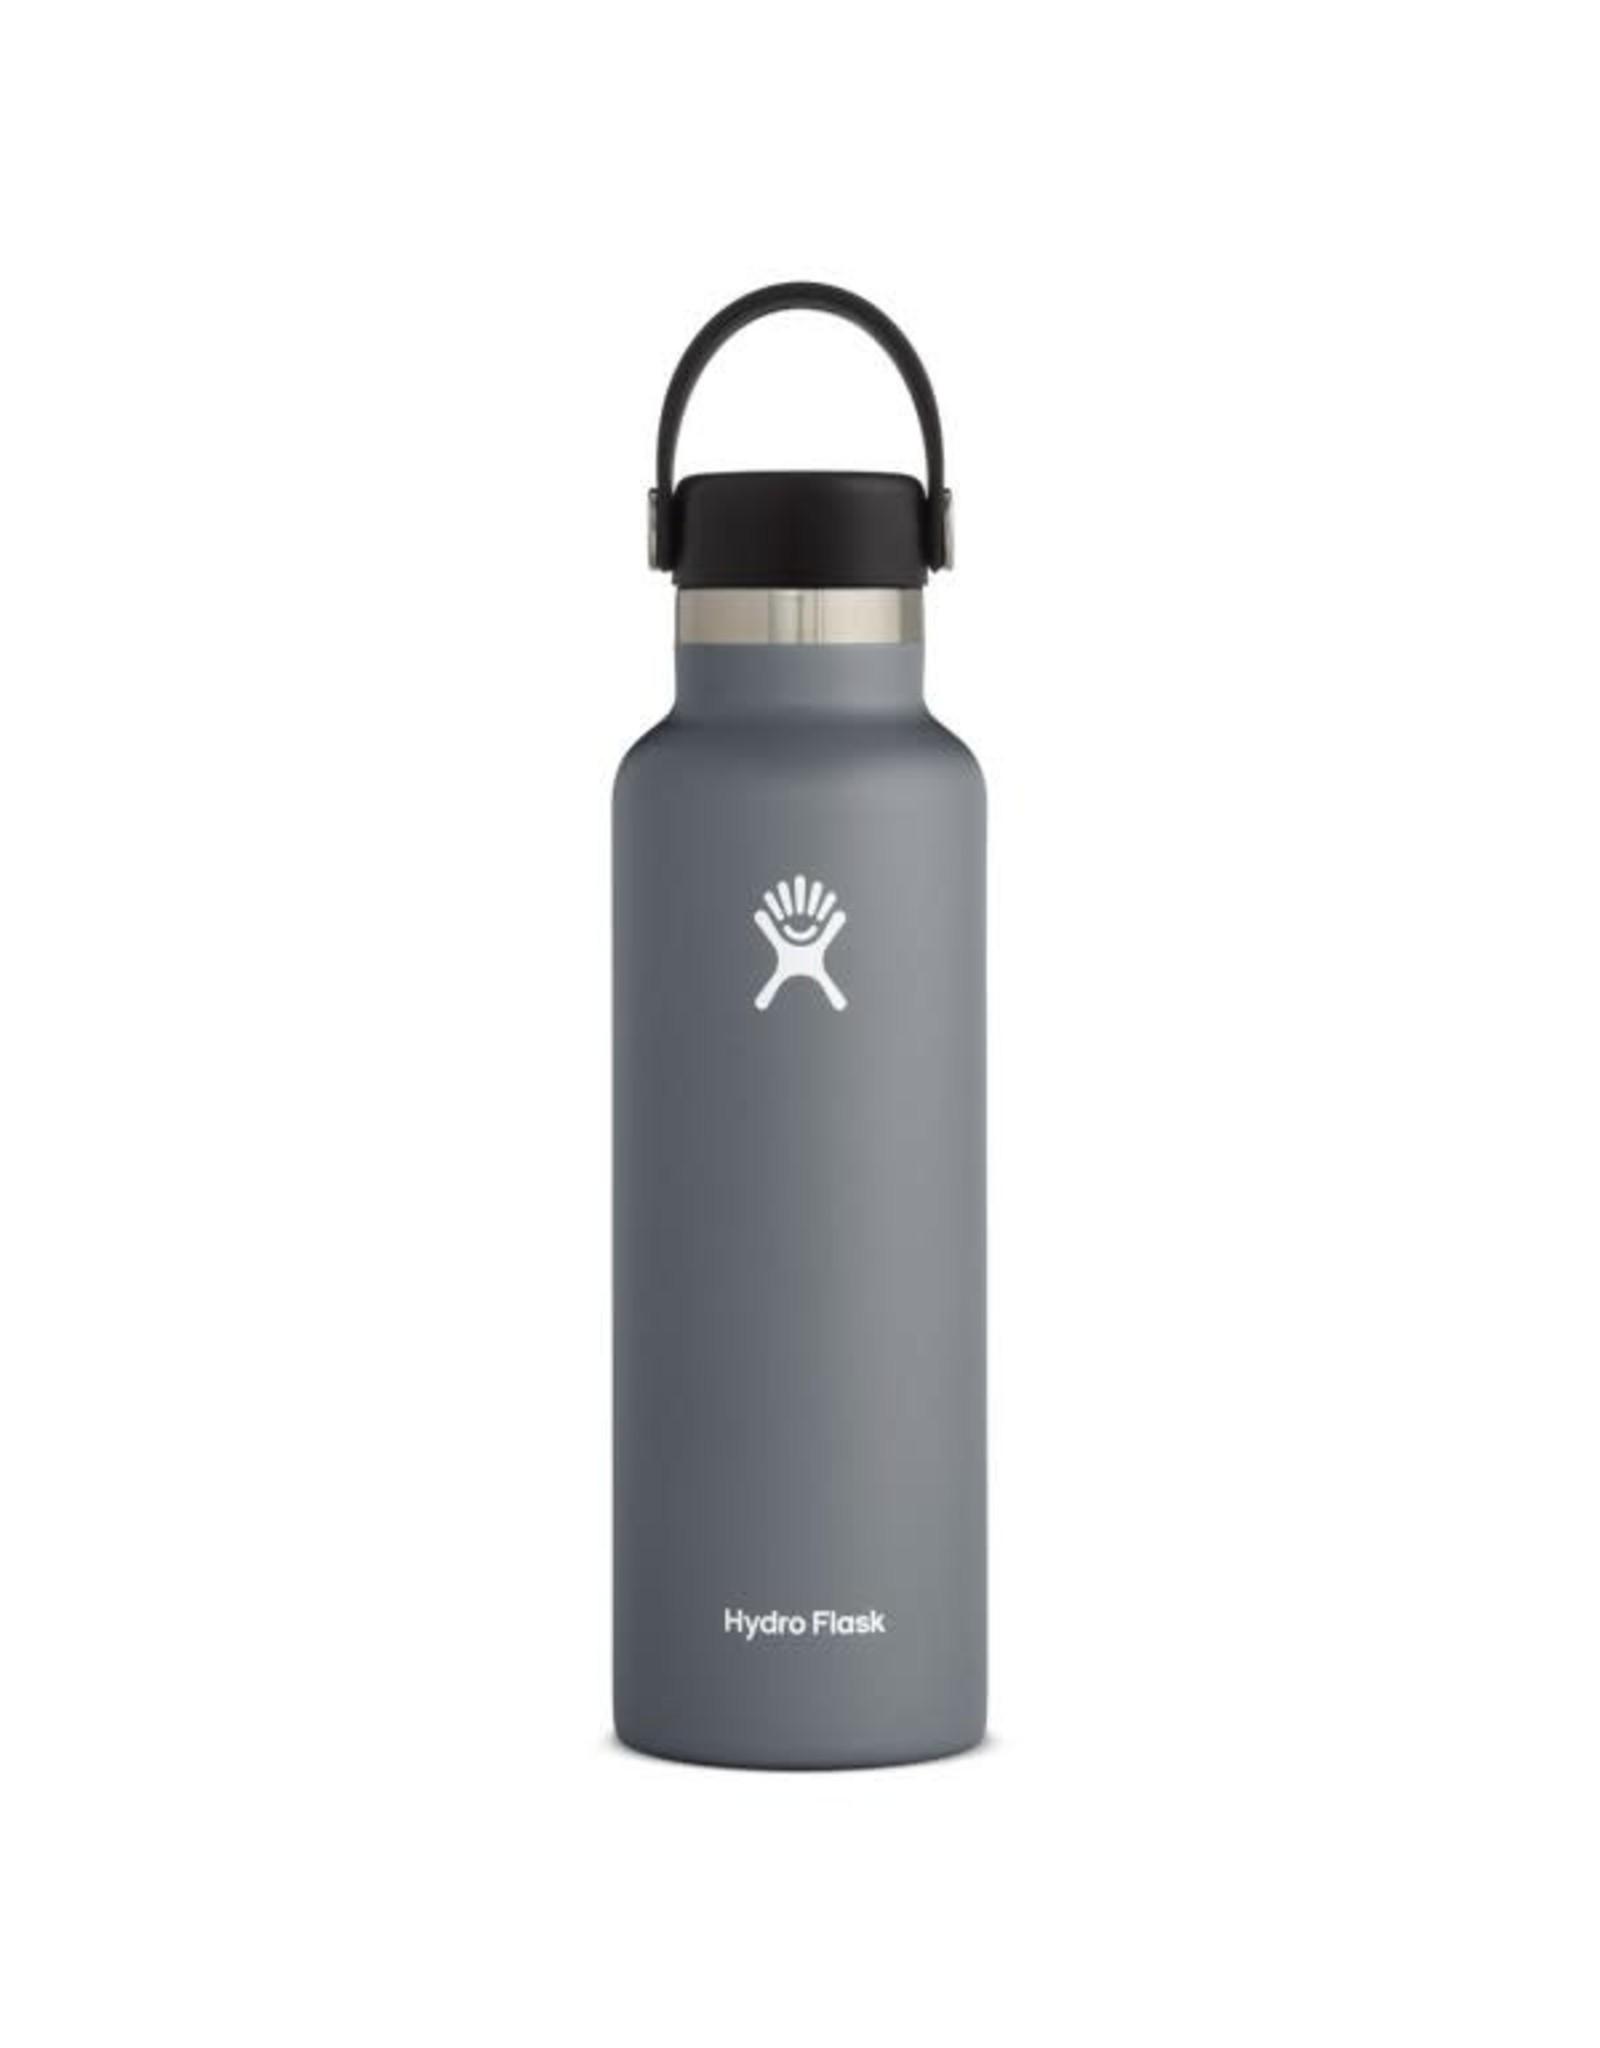 Hydro Flask Hydro Flask 21oz Standard Mouth w/ Flex Cap Stone